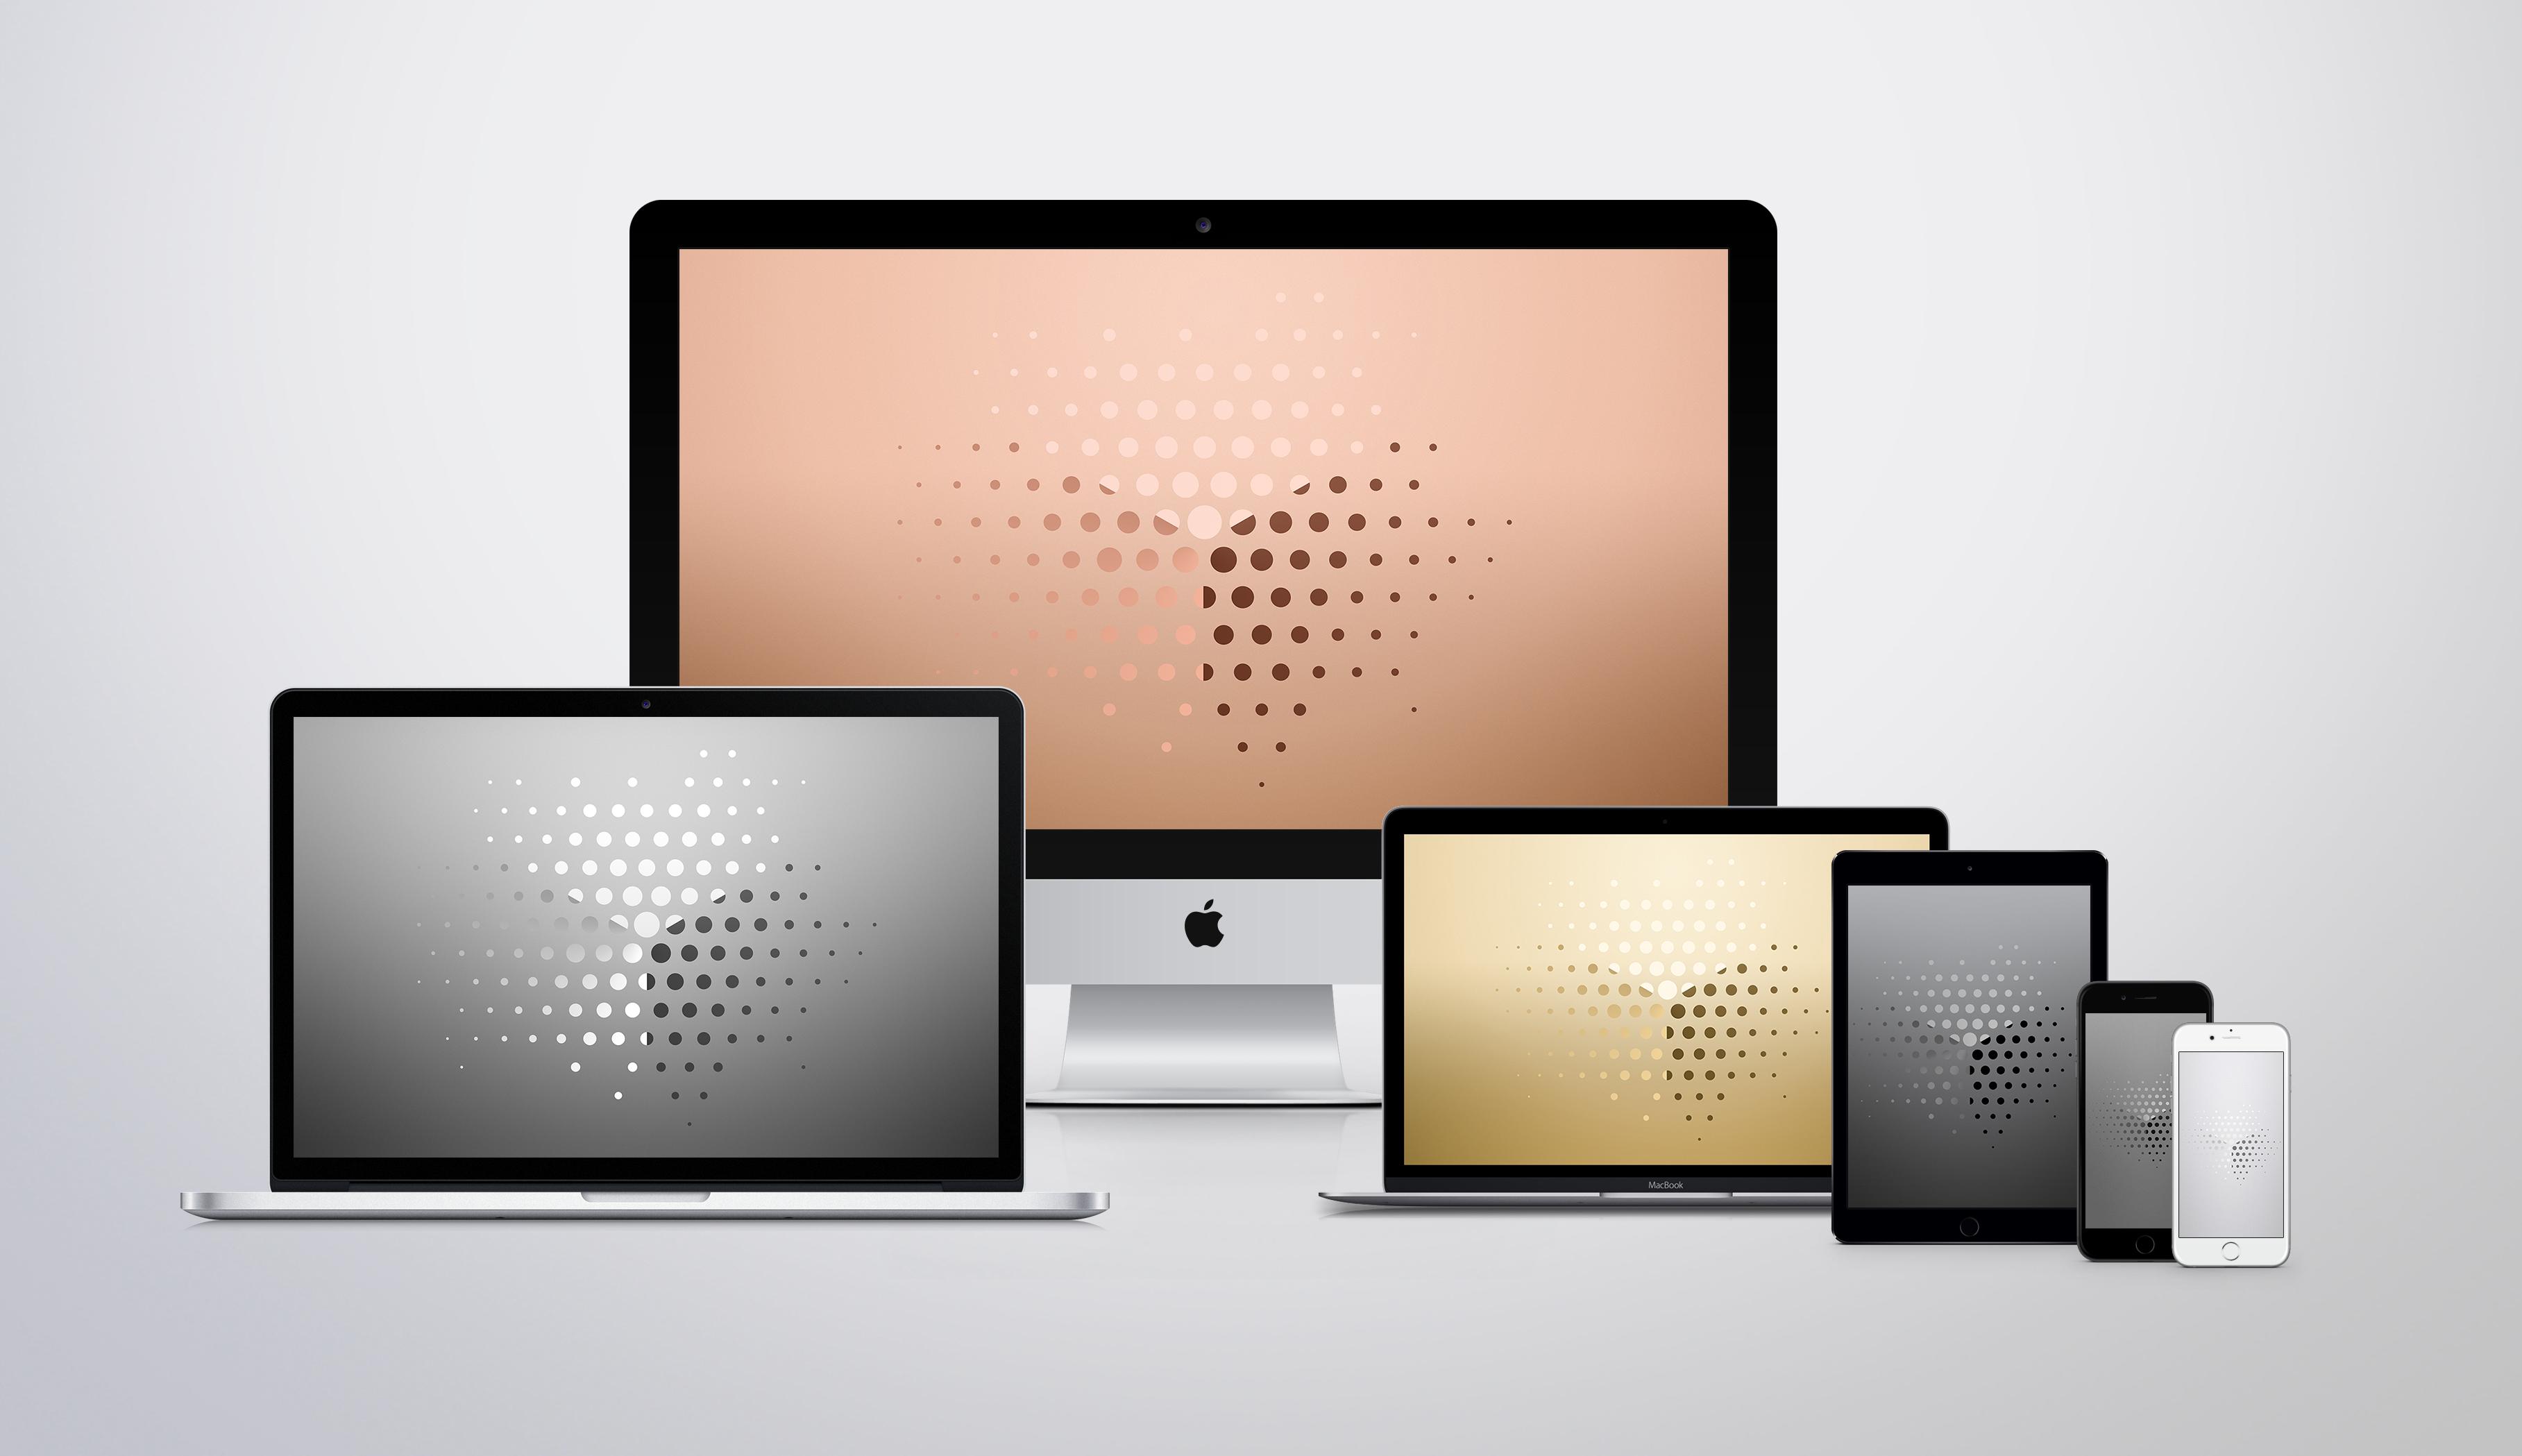 Apple Watch App Wallpaper Set